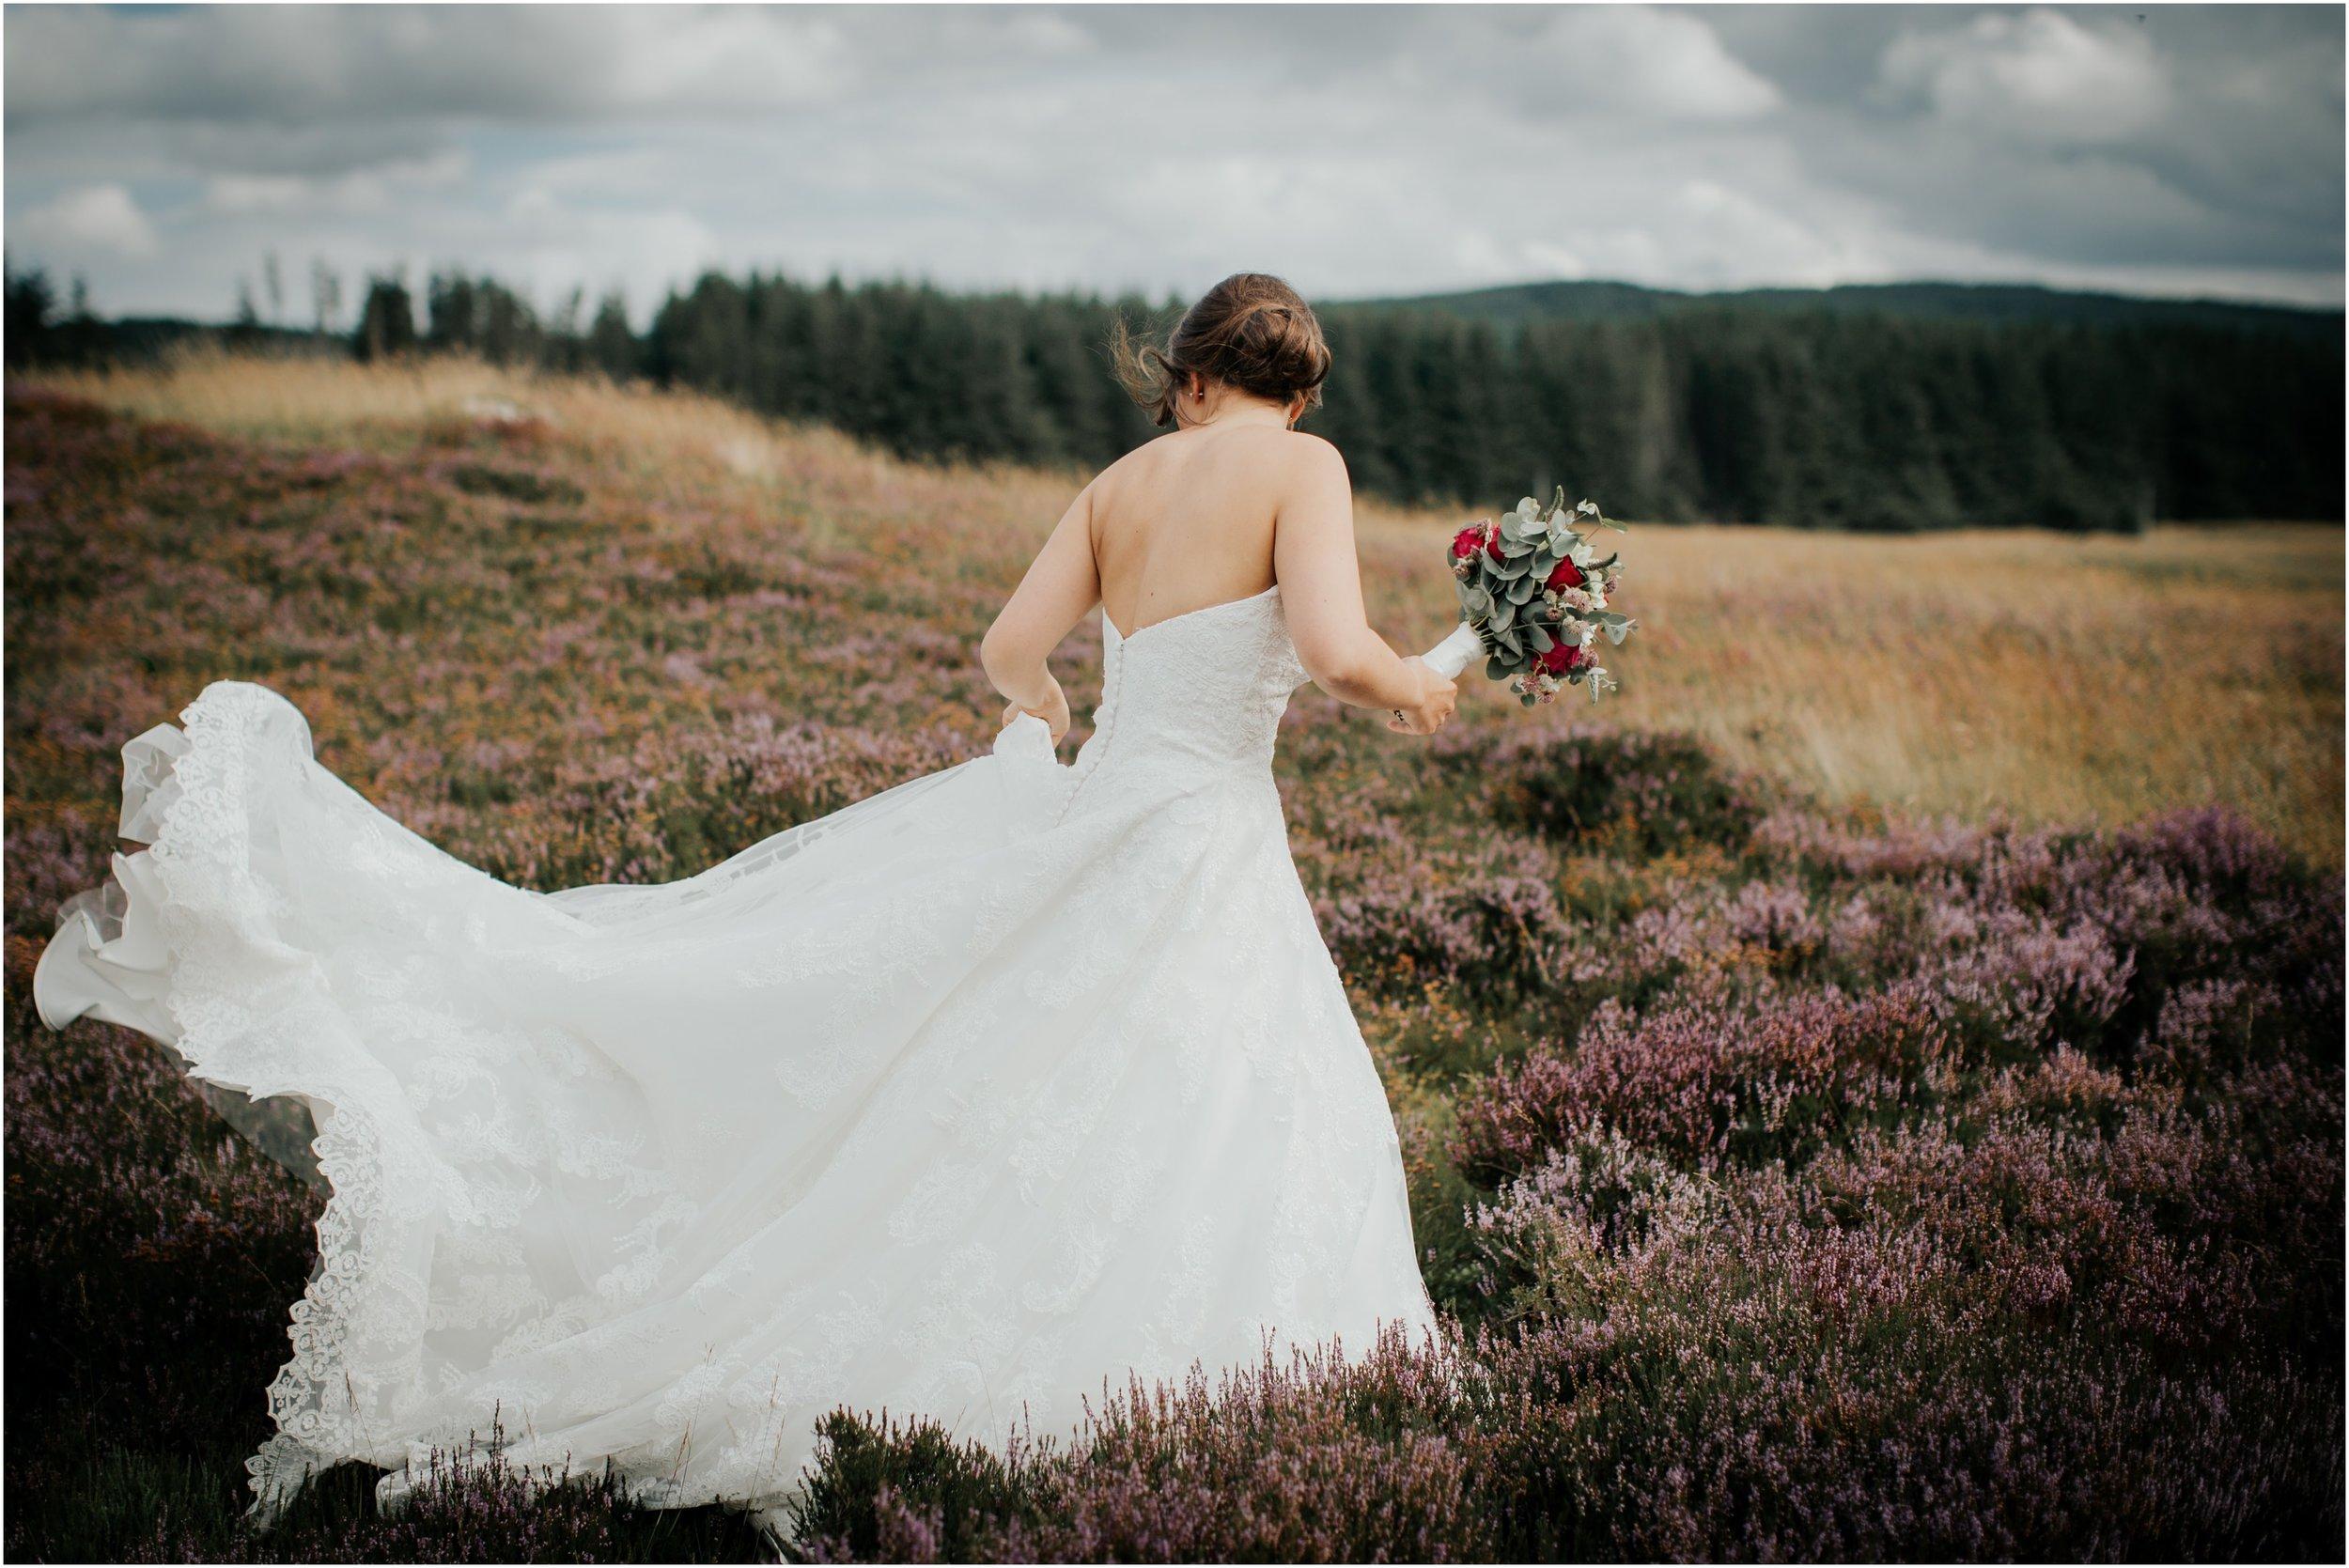 Photography 78 - Glasgow Wedding Photographer - Year in Reveiw_0016.jpg